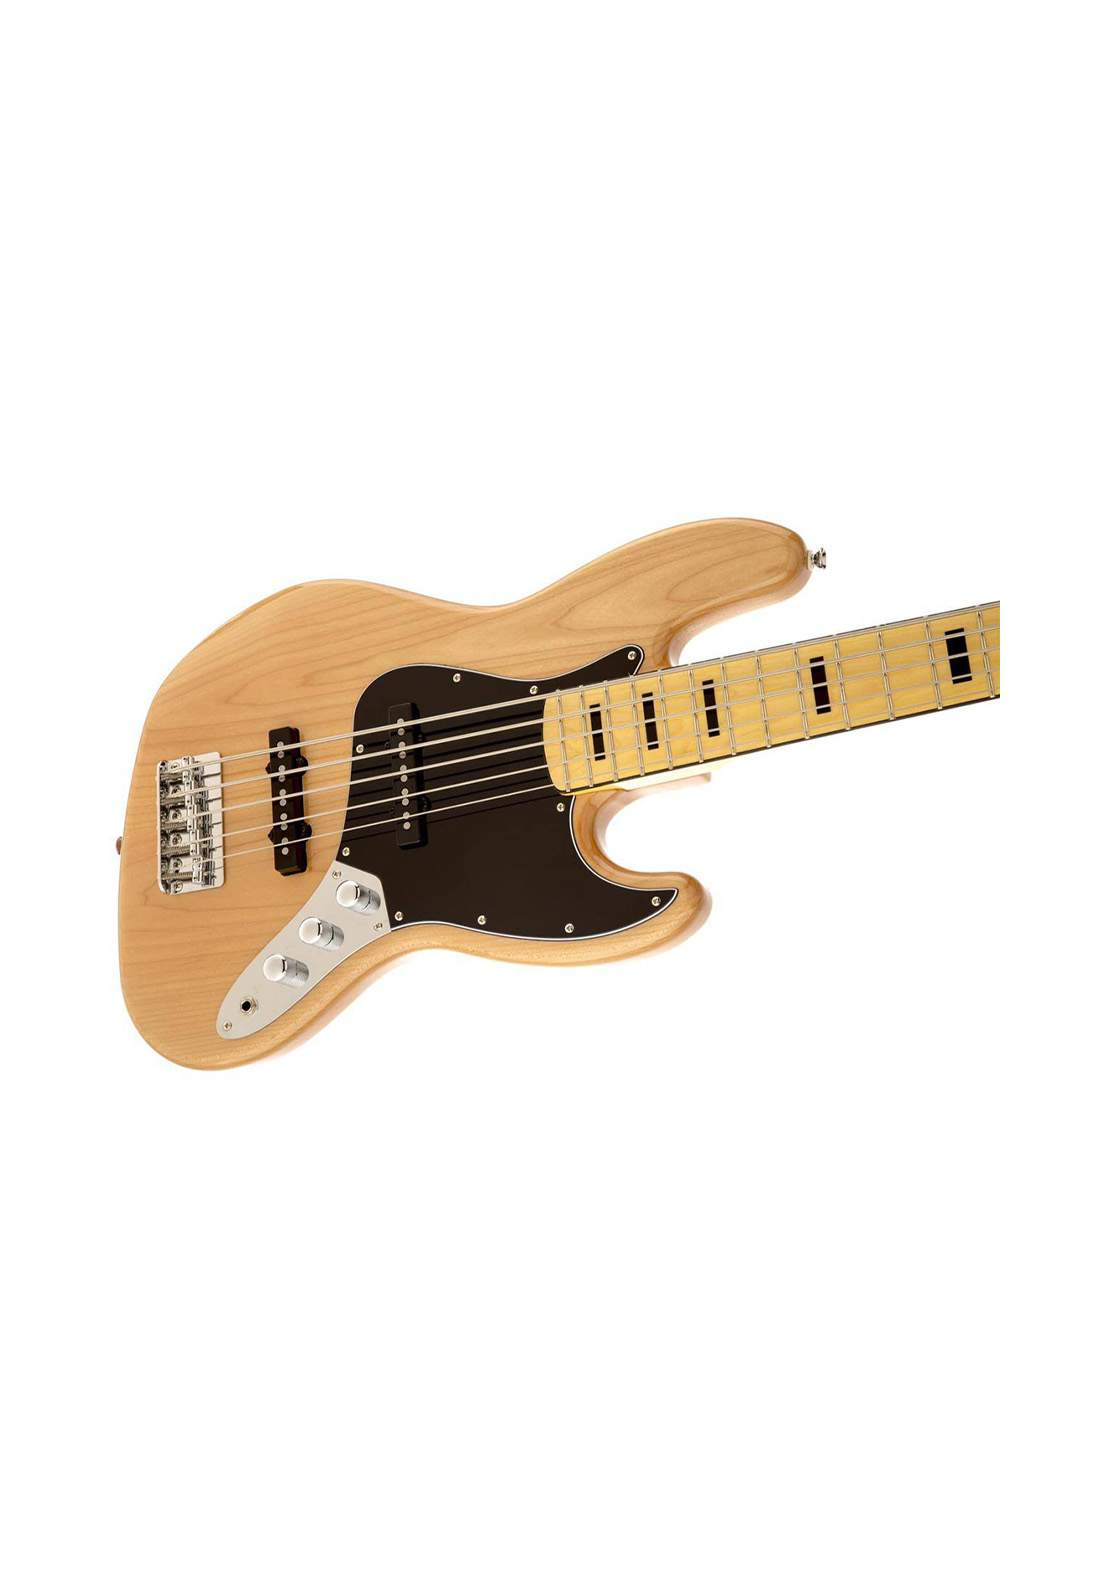 Fender Jazz Bass Guitar - بيز جيتار